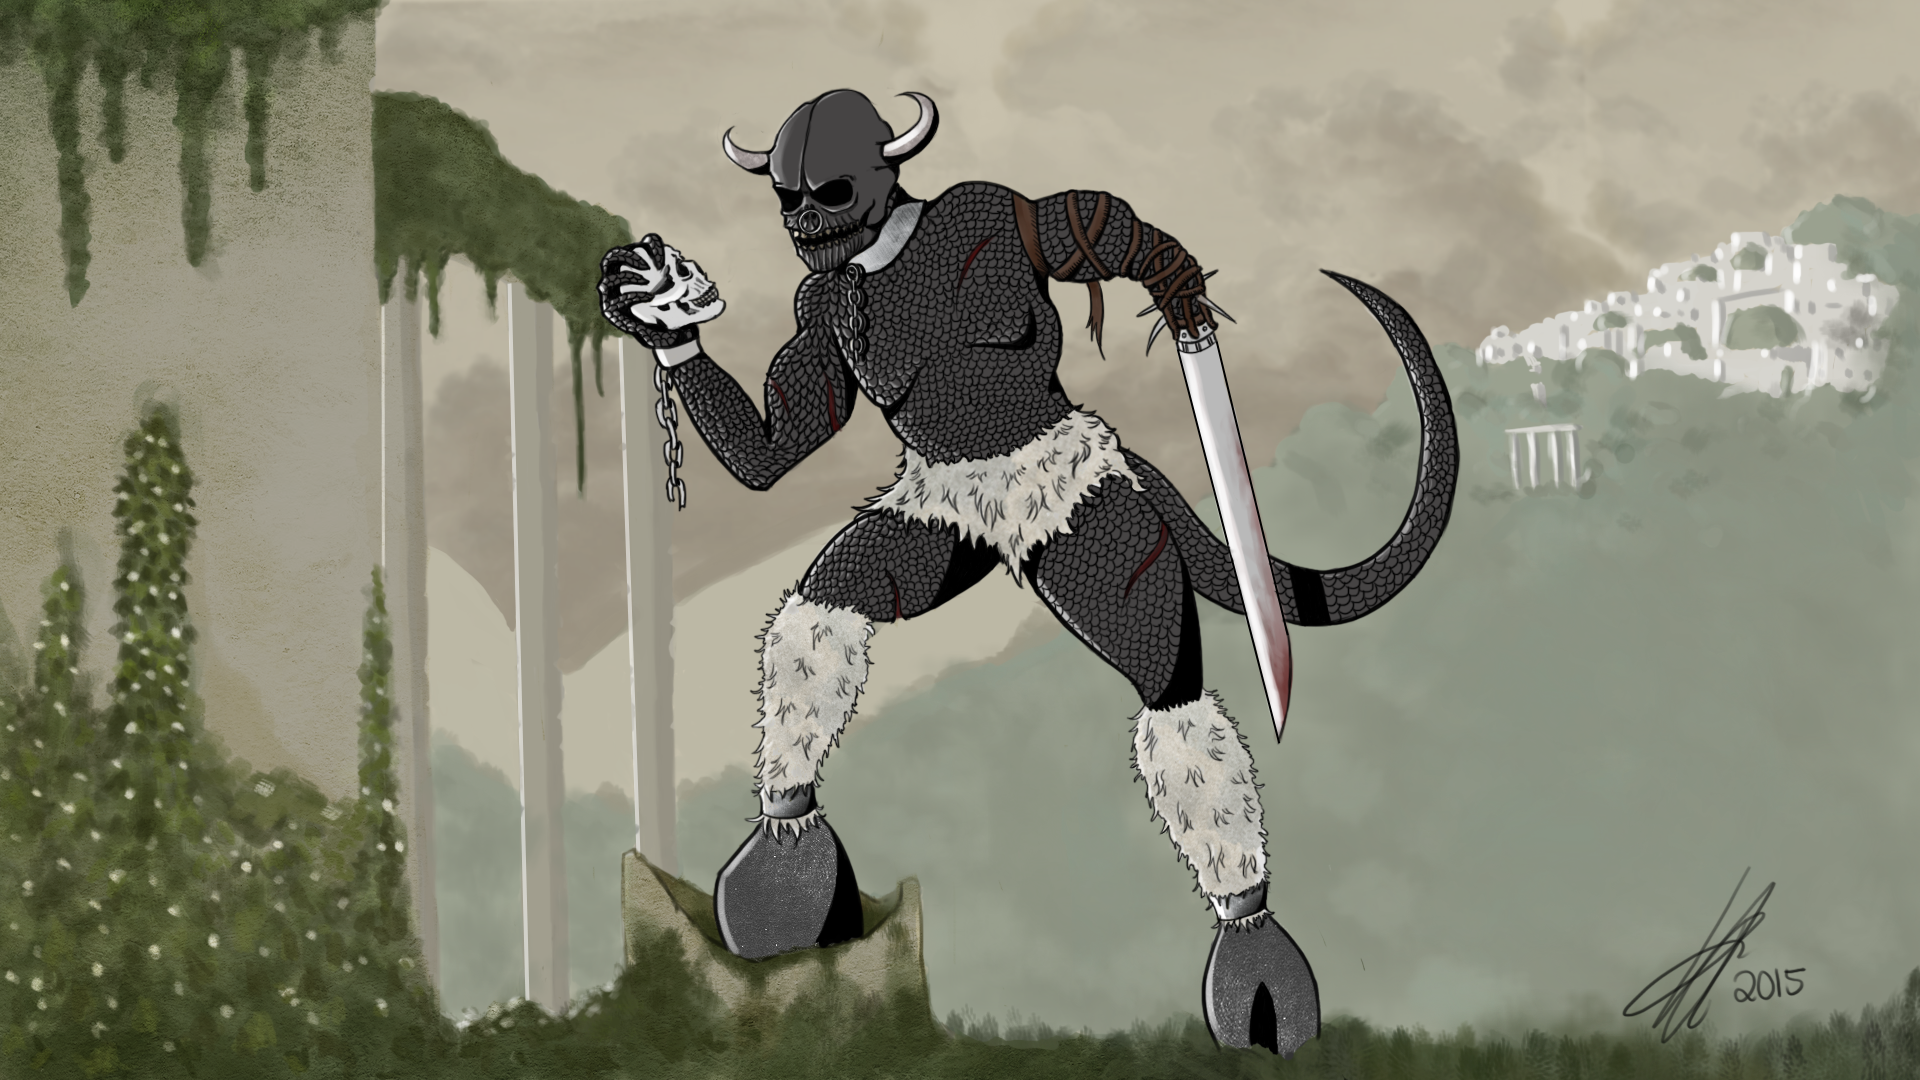 The Gruesome Grimataur